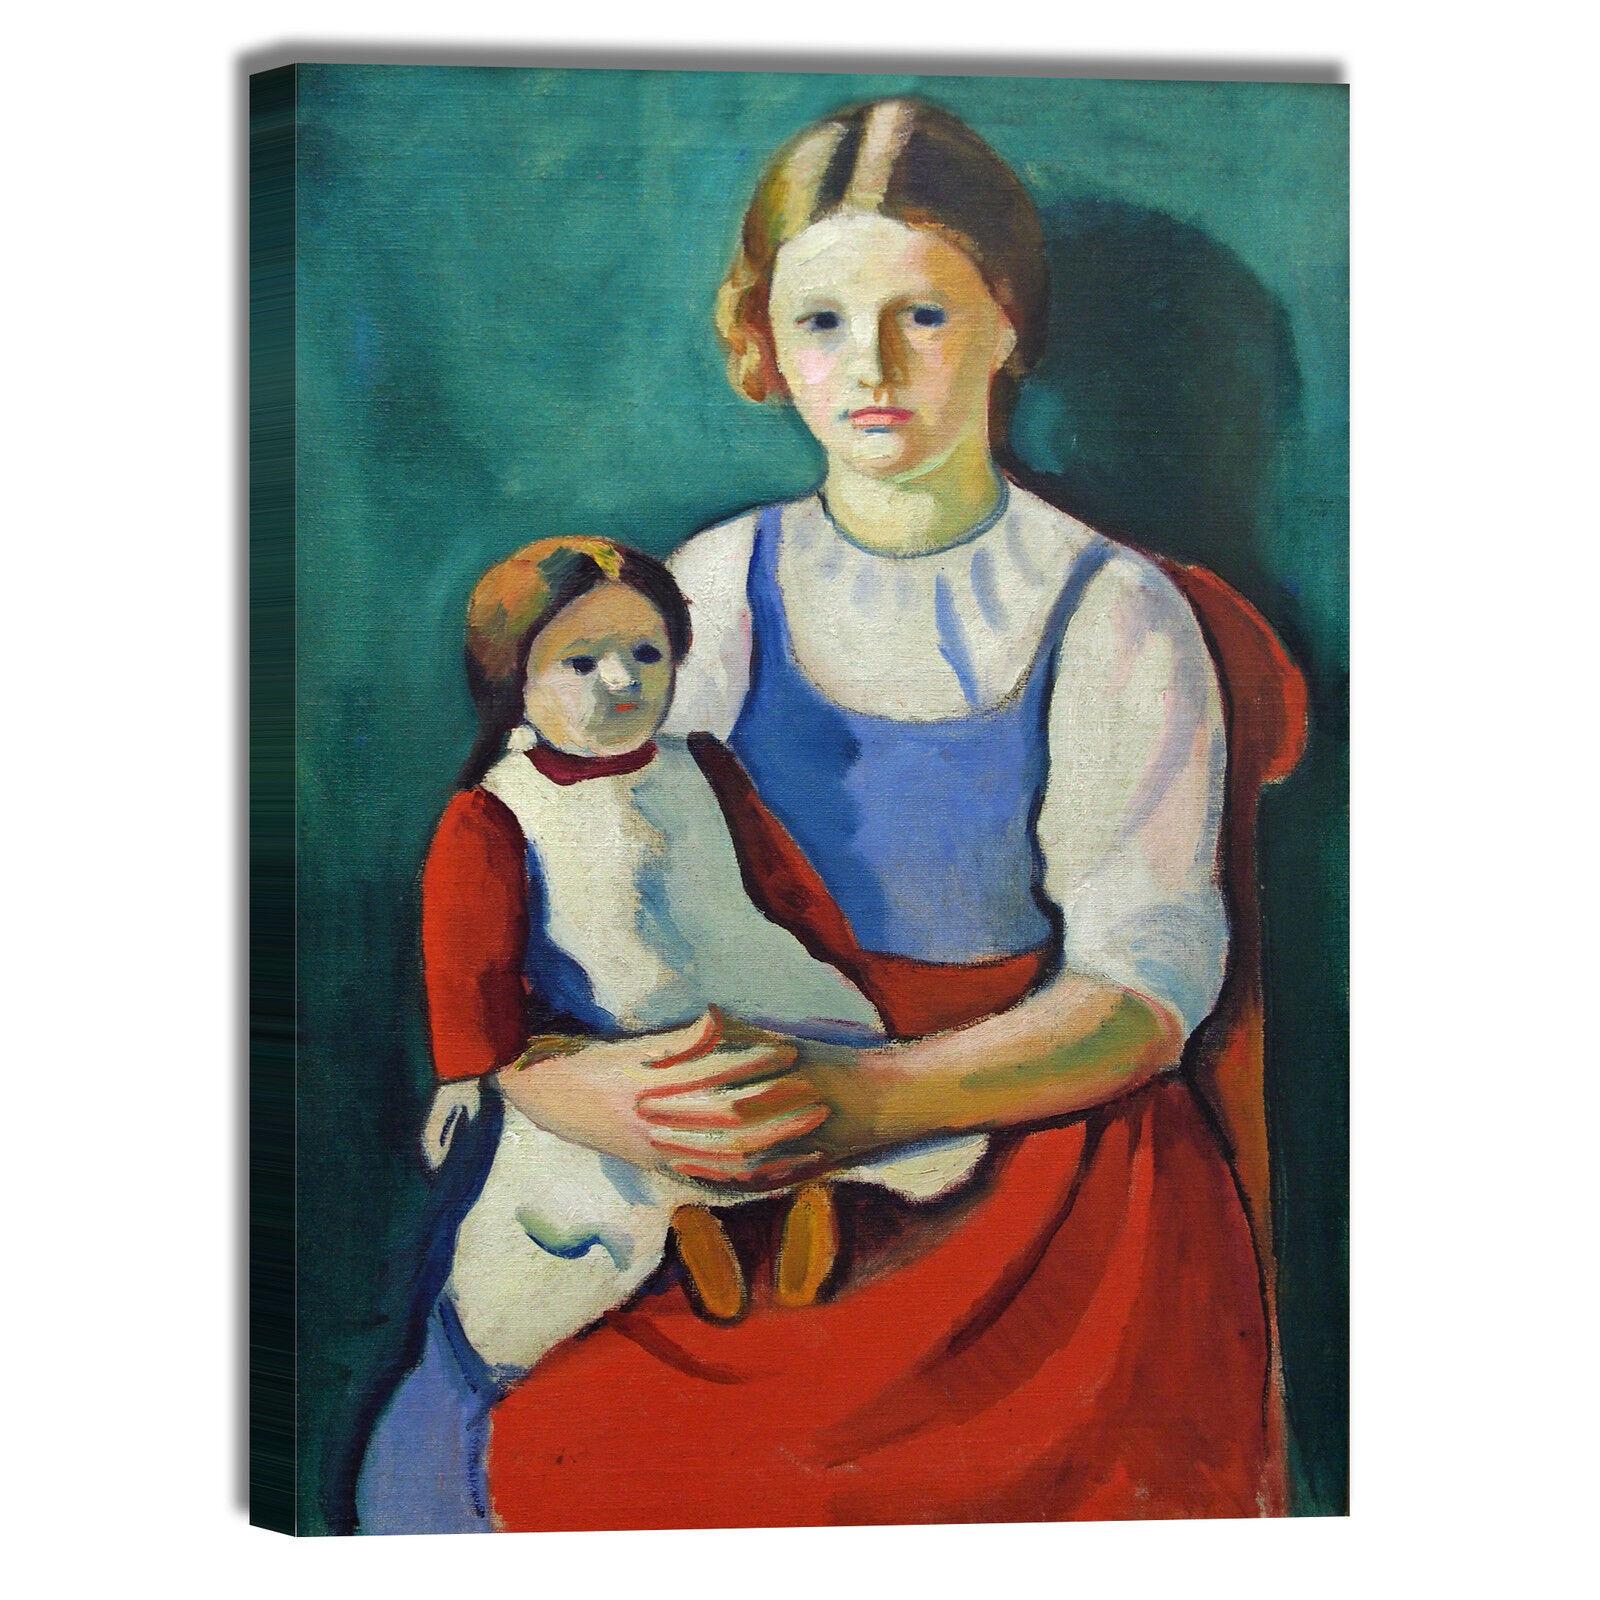 Macke ragazza con bionda con ragazza bambola quadro stampa tela dipinto telaio arRouge o casa 562a7c